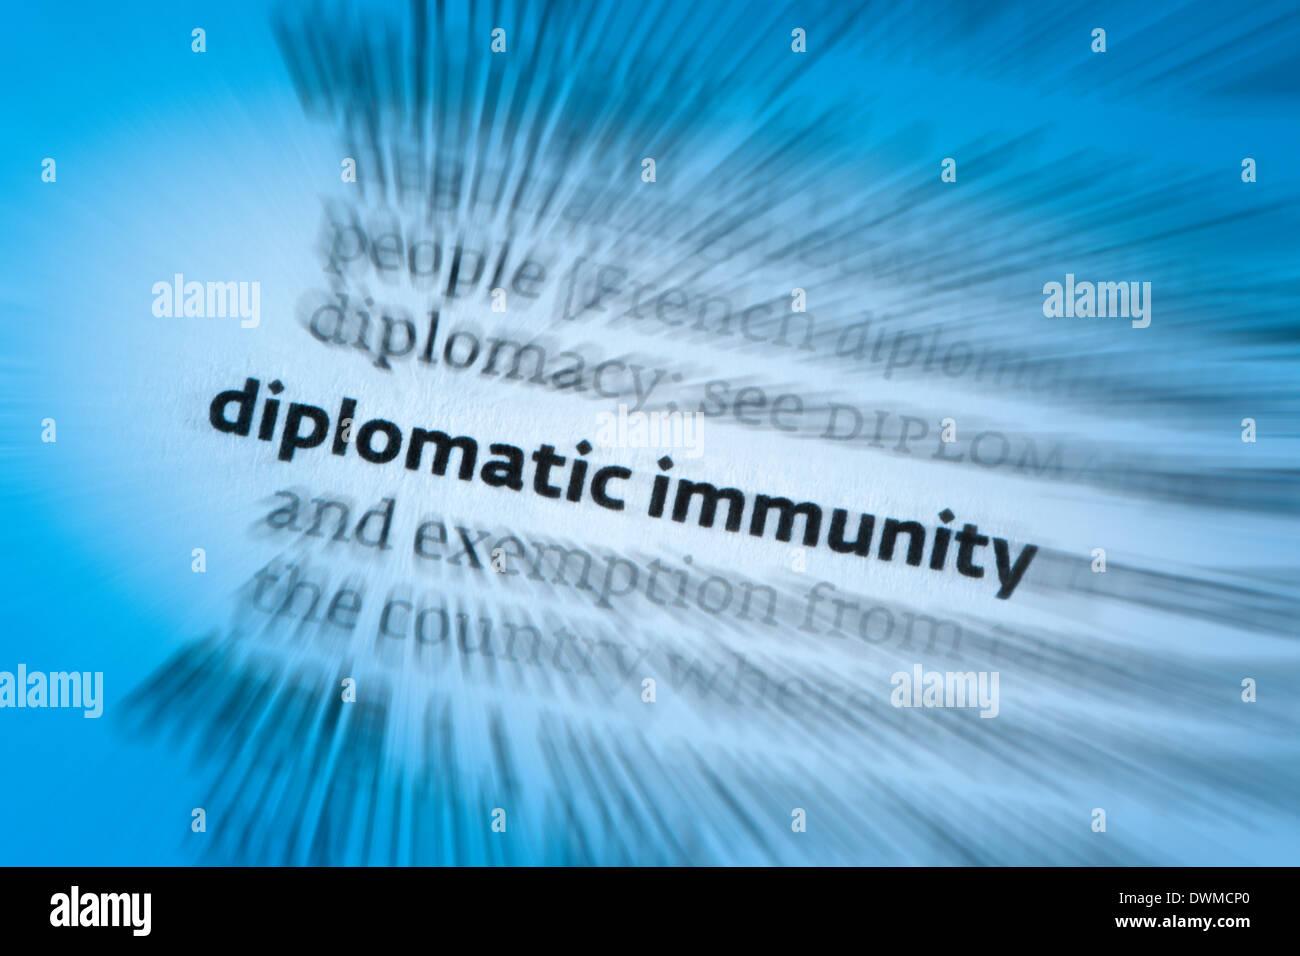 Diplomatic immunity - Stock Image